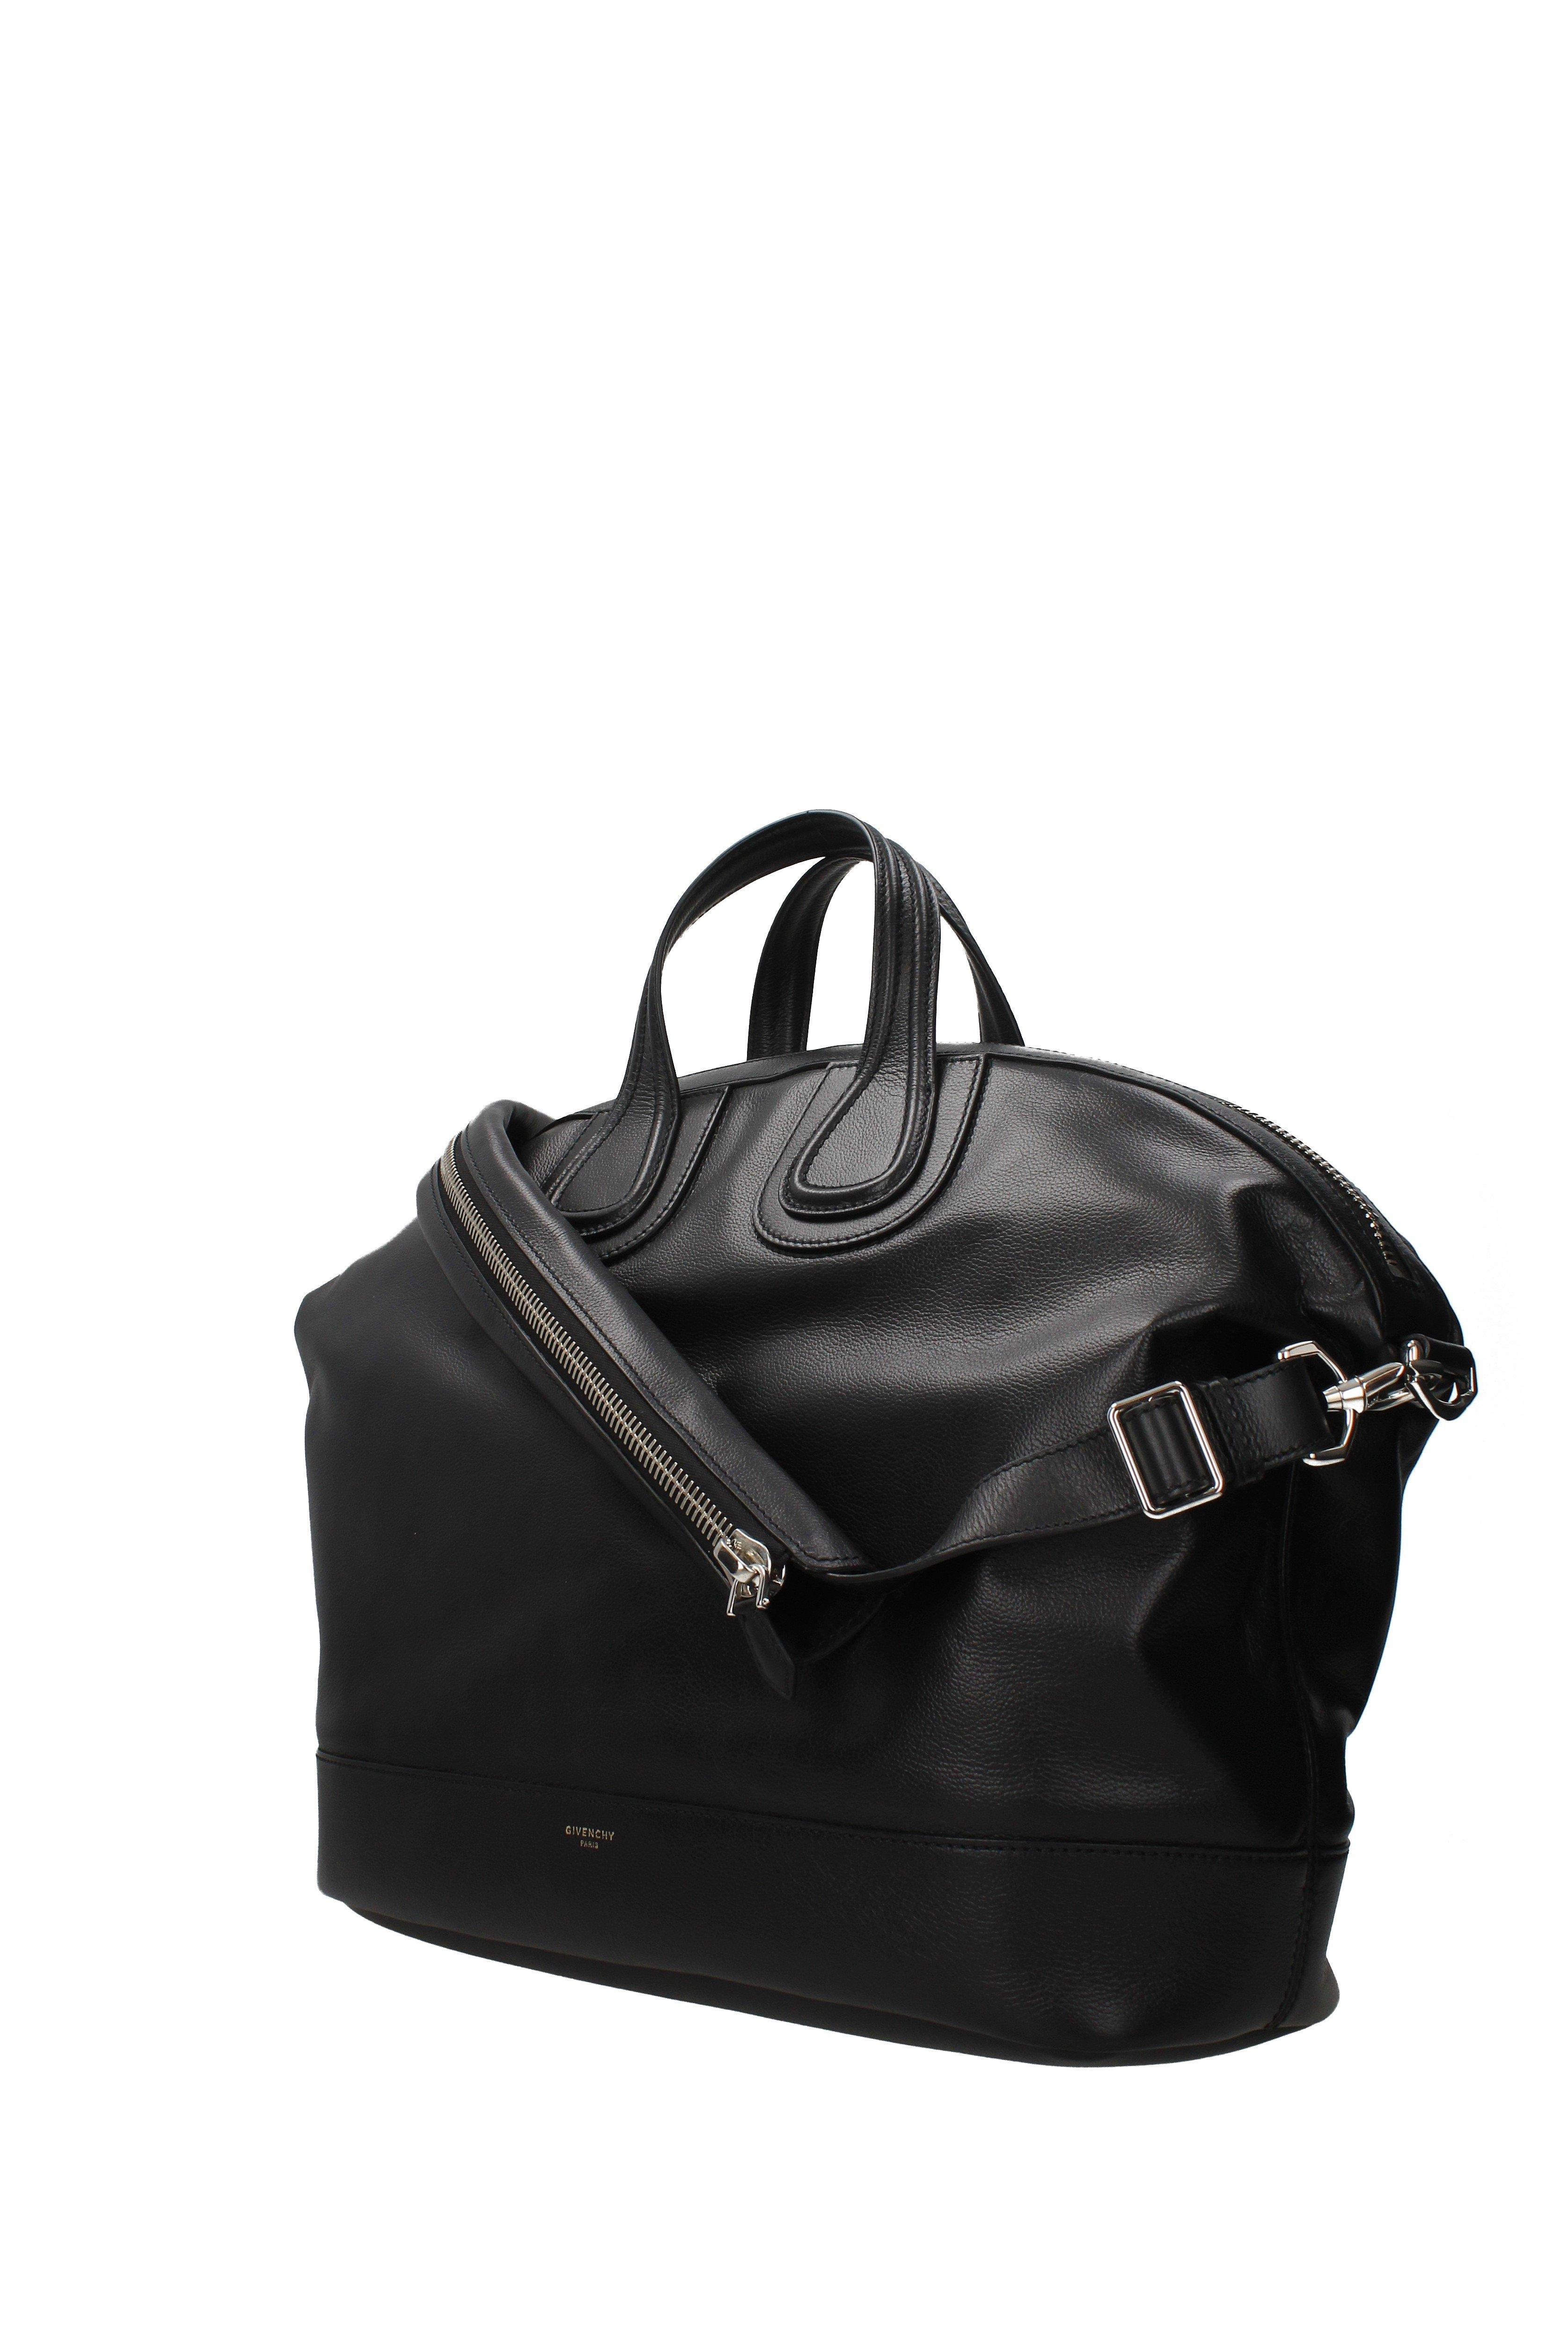 f5dc48fbe2 Givenchy - Travel Bags Men Black for Men - Lyst. View fullscreen